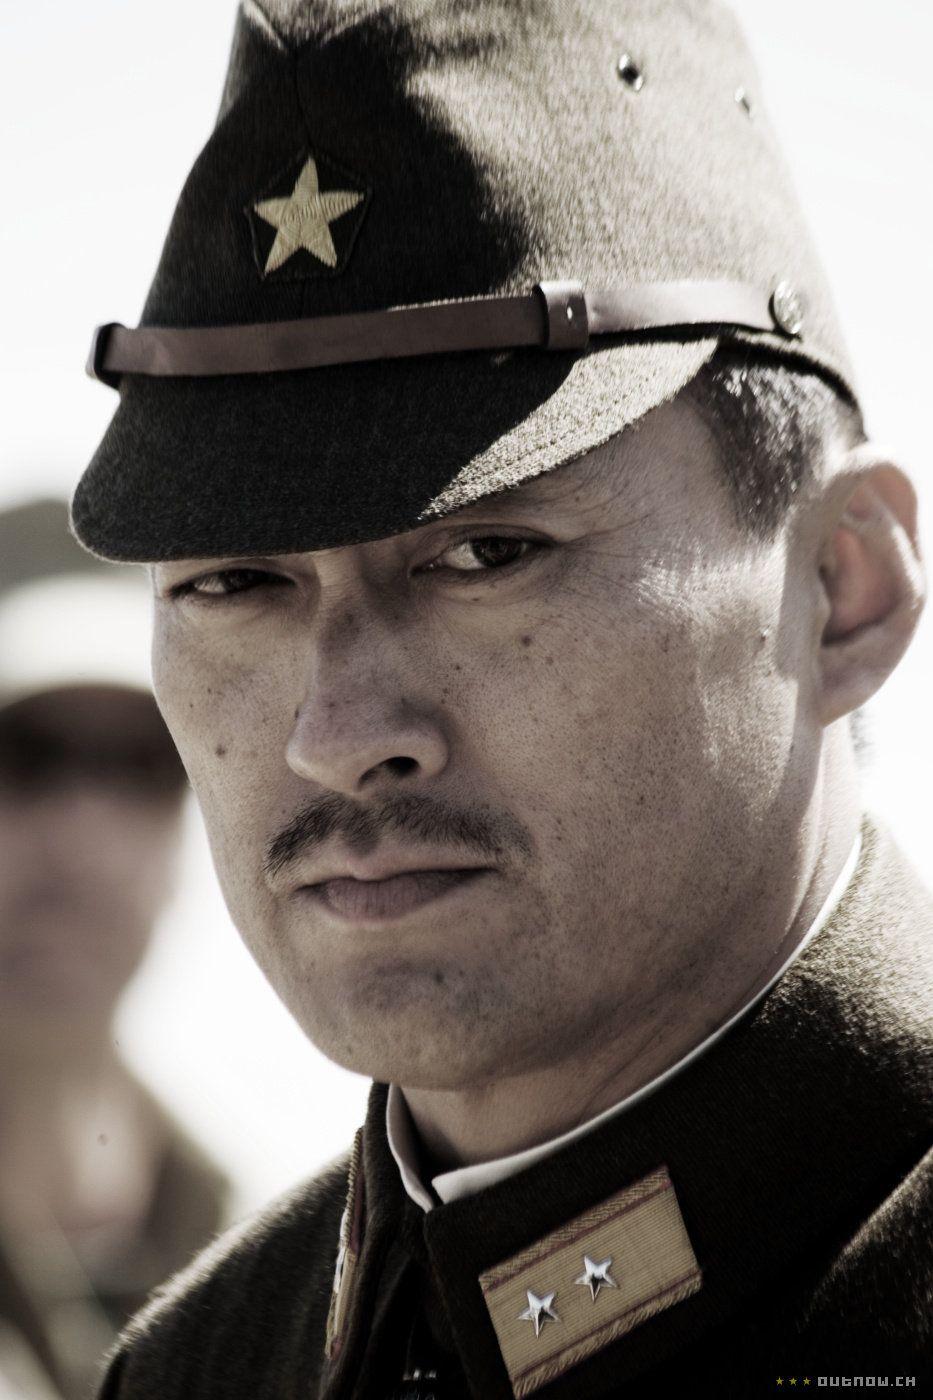 General Tadamichi Kuribayashi - Ken Watanabe in Letters from Iwo Jima (2006).